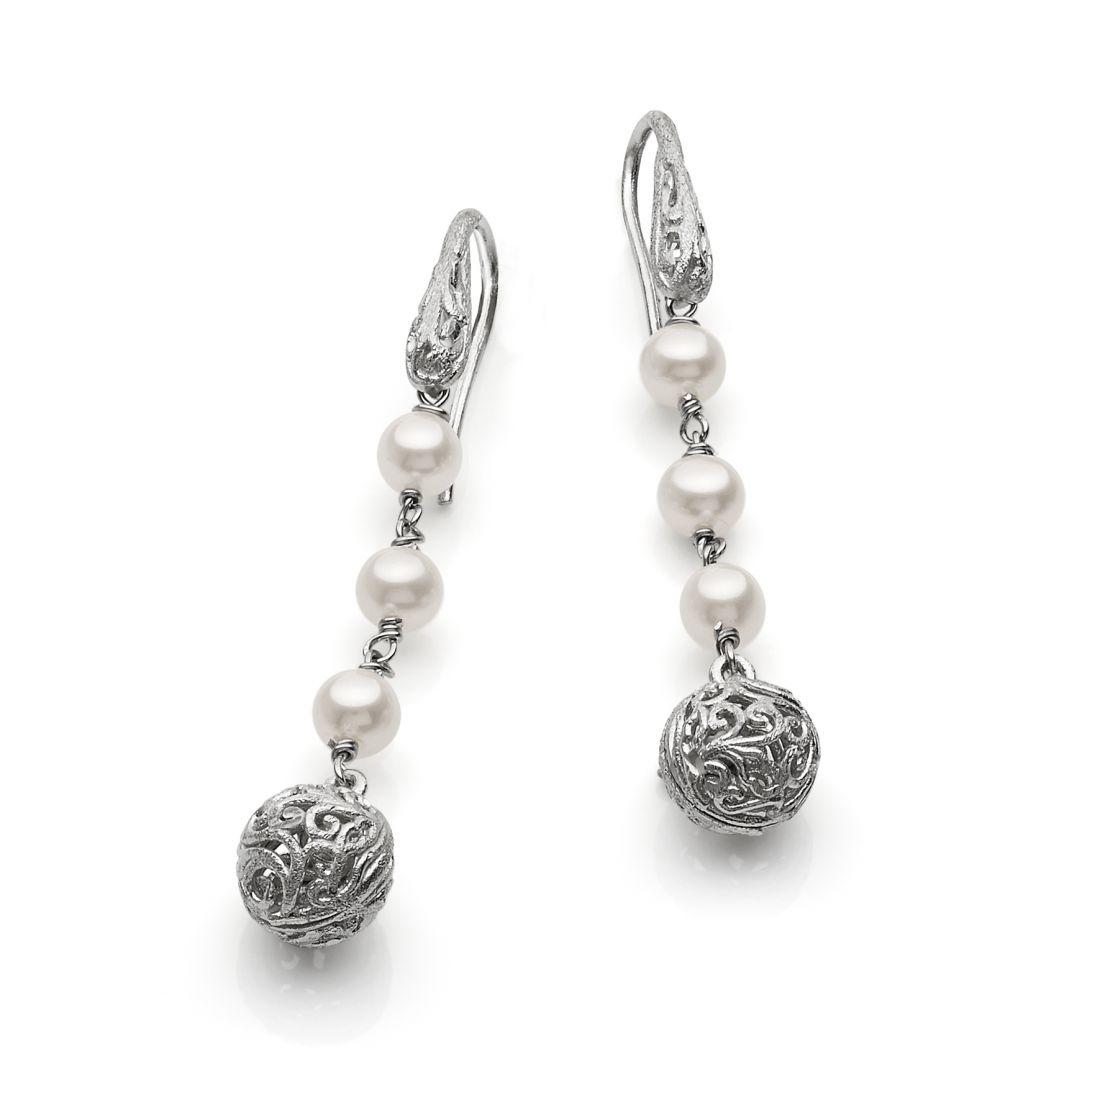 Damas sphere drop earrings